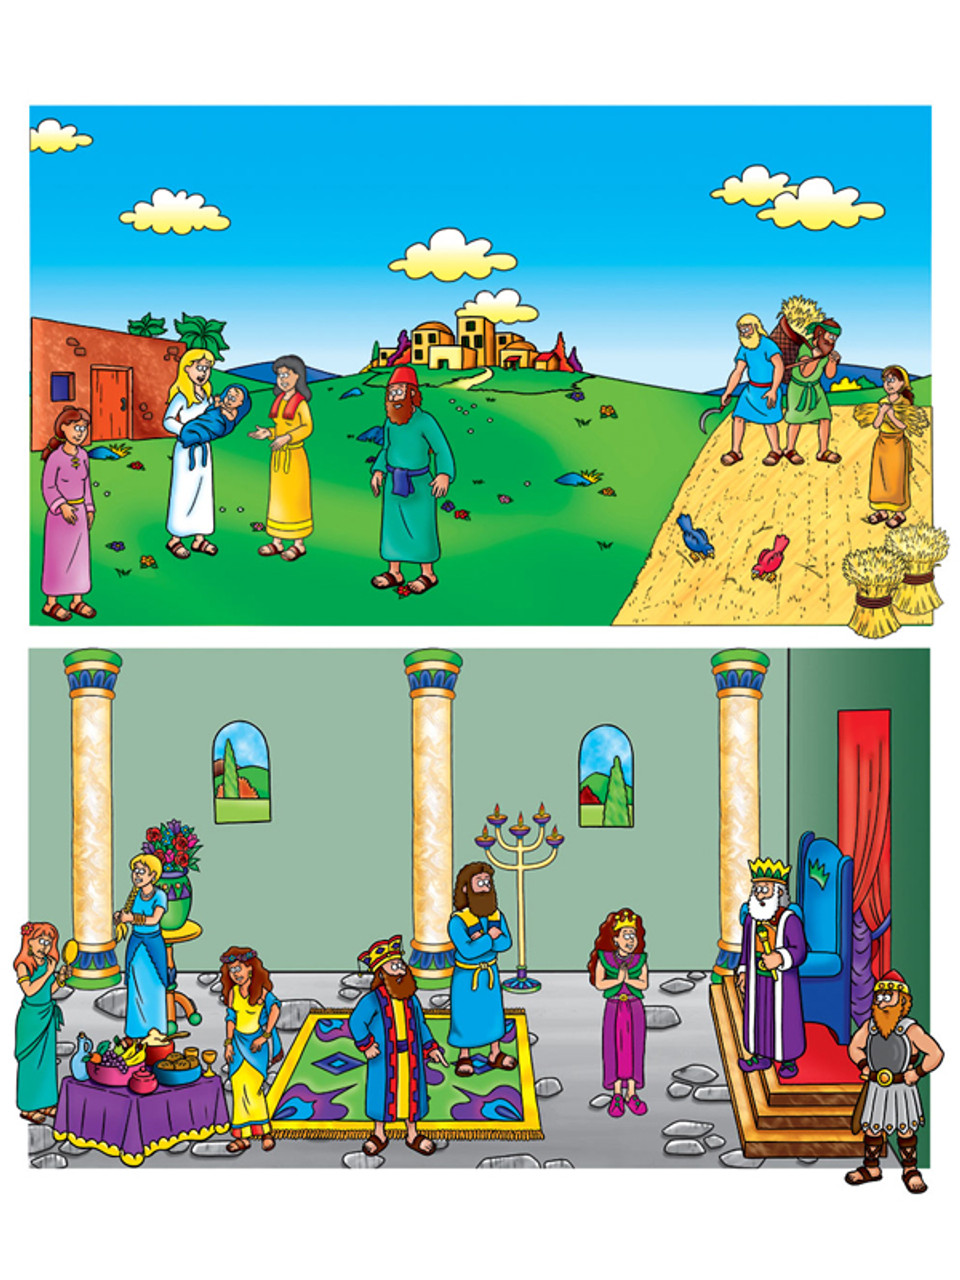 Ruth & Esther - Beginniers Bible (Pre-cut)